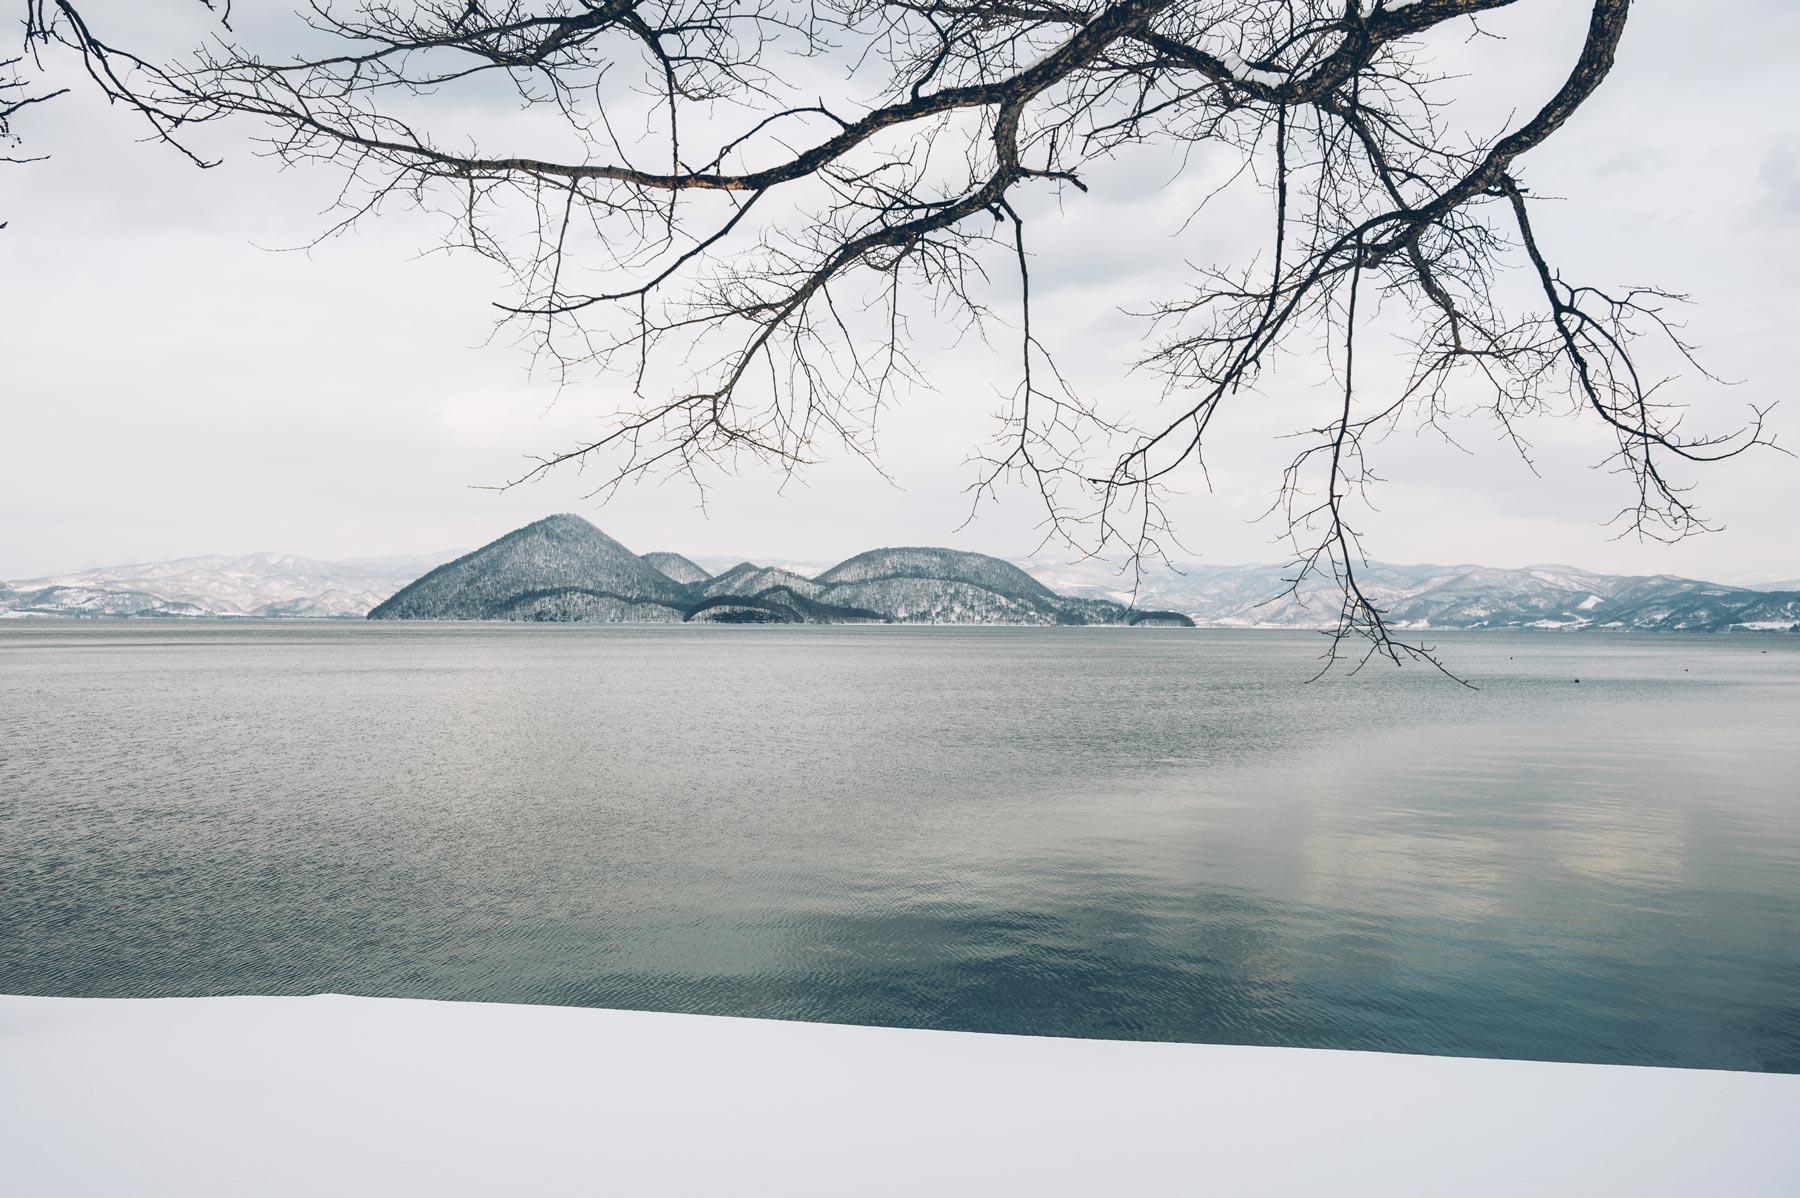 Lac Toya